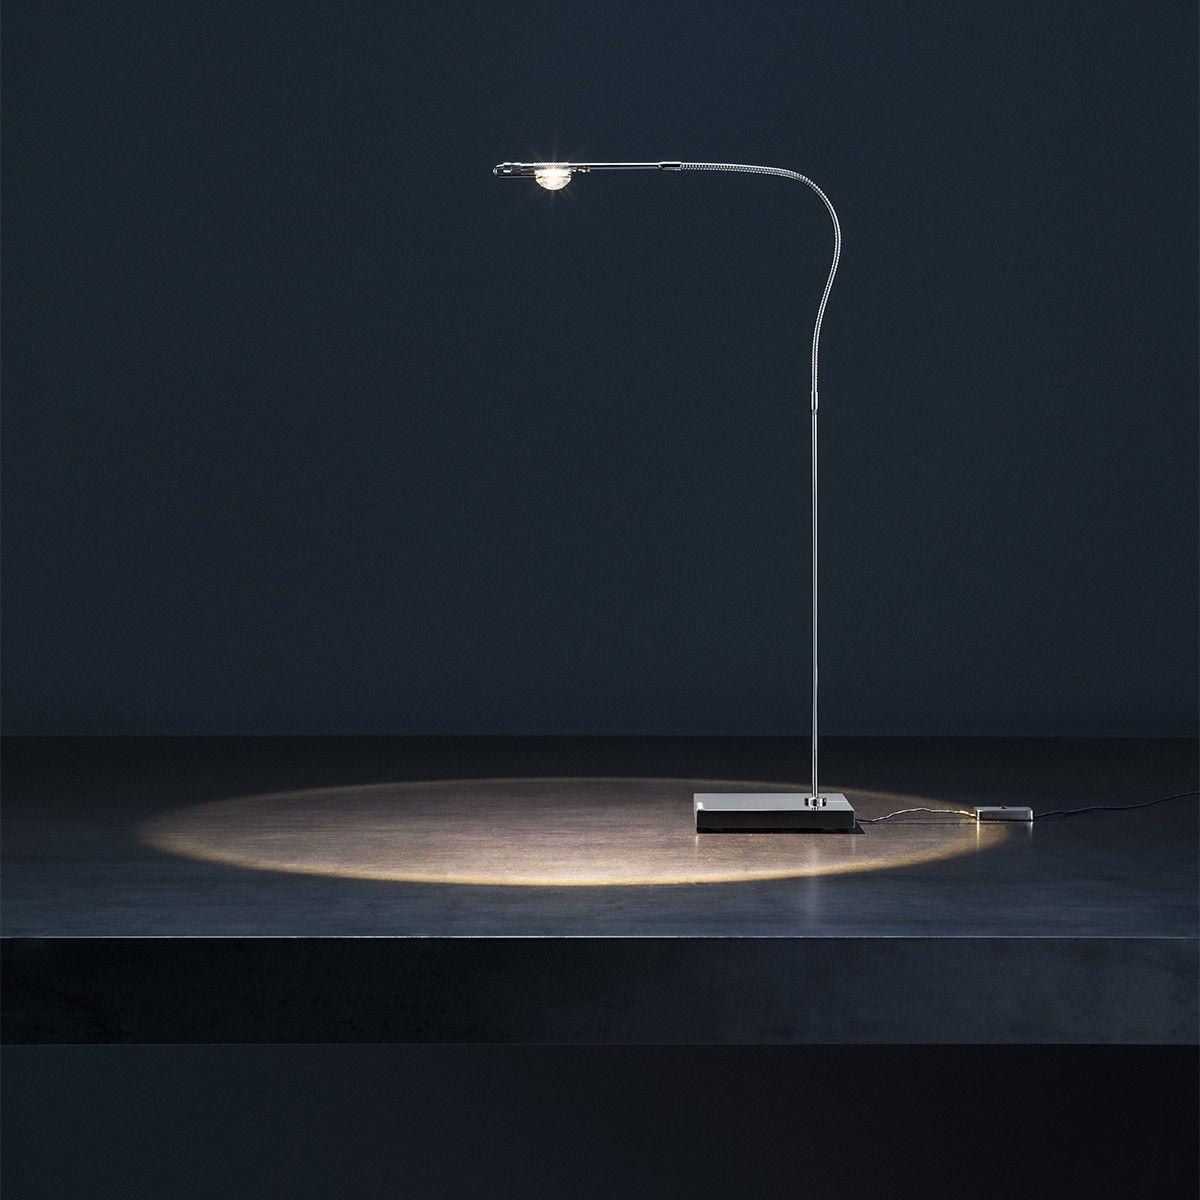 esstischlampe modern led   led tischlampe   schlafzimmer lampe kugel   tischlampe messing dimmb ...